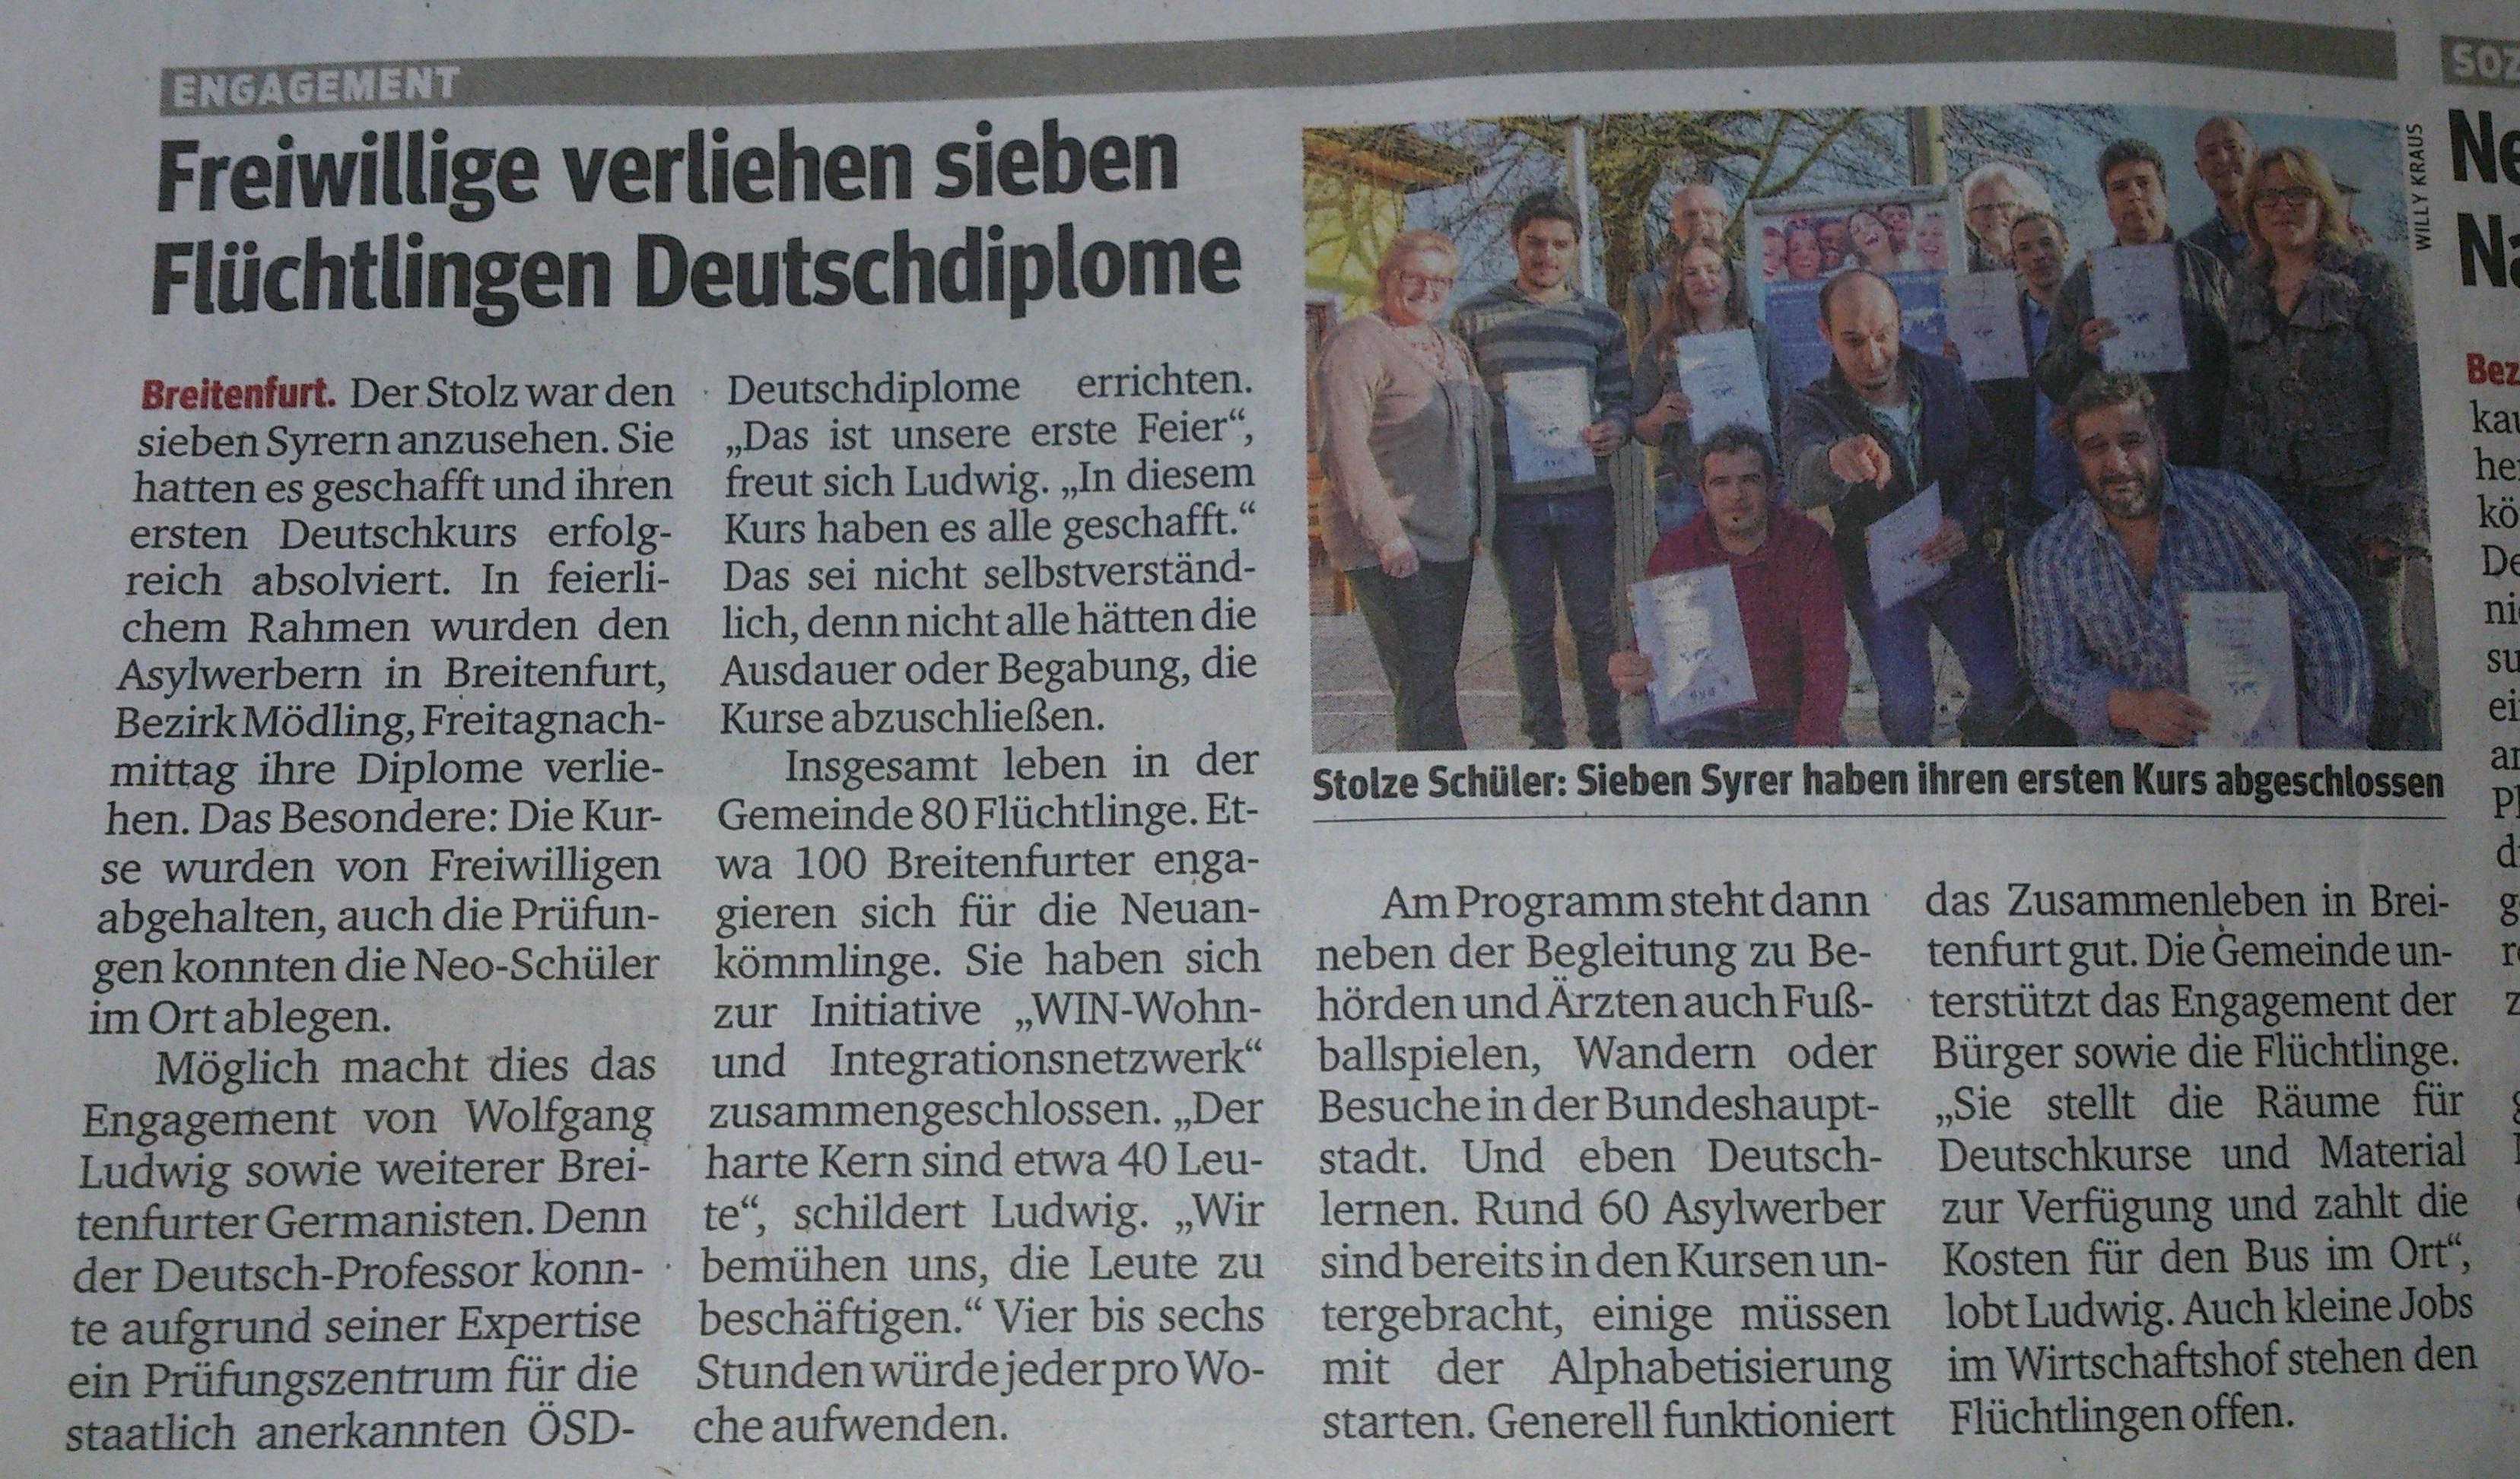 Deutschdiplome KURIER